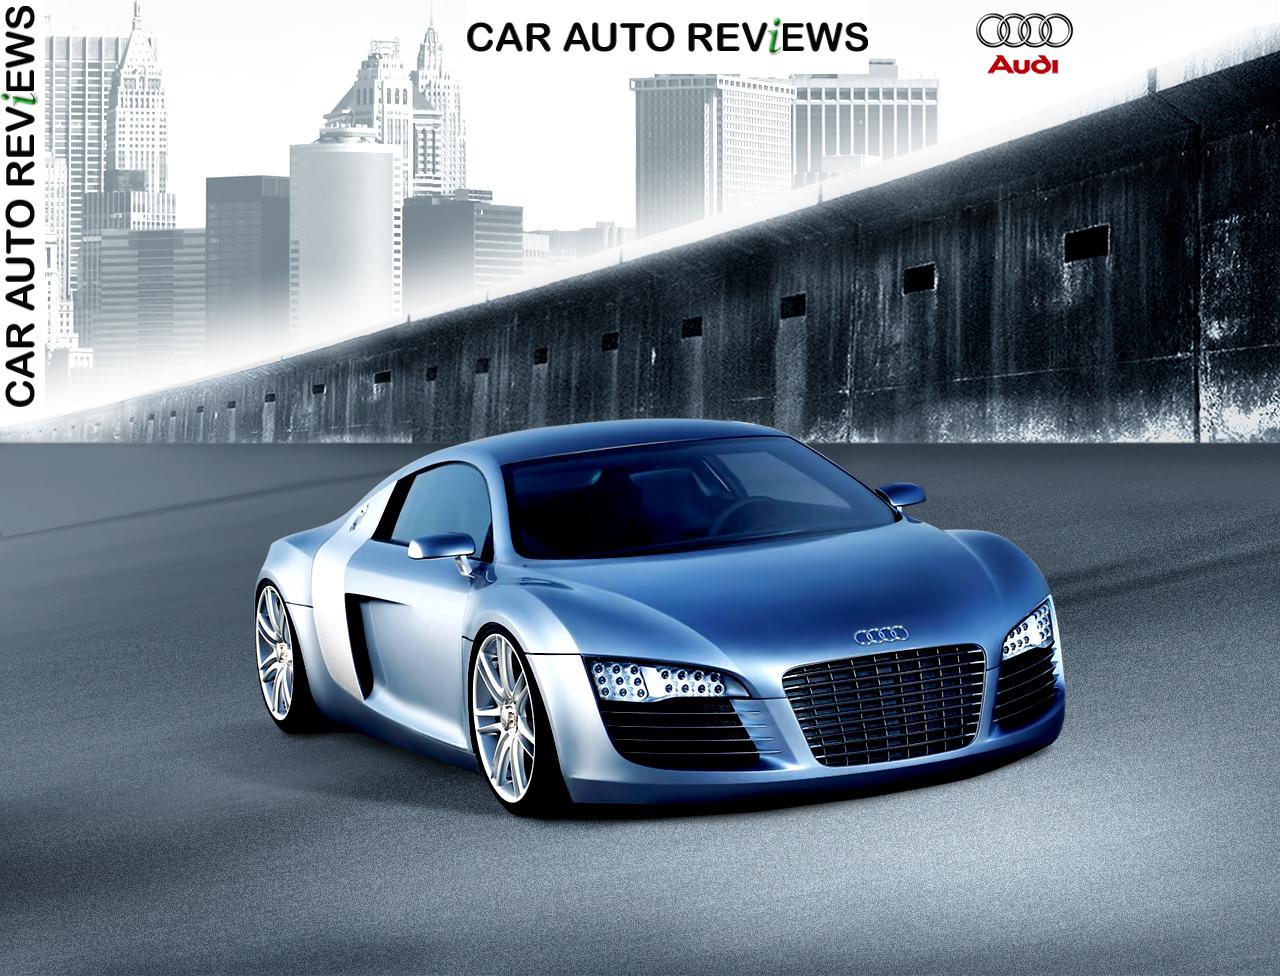 New Car Models For 2012